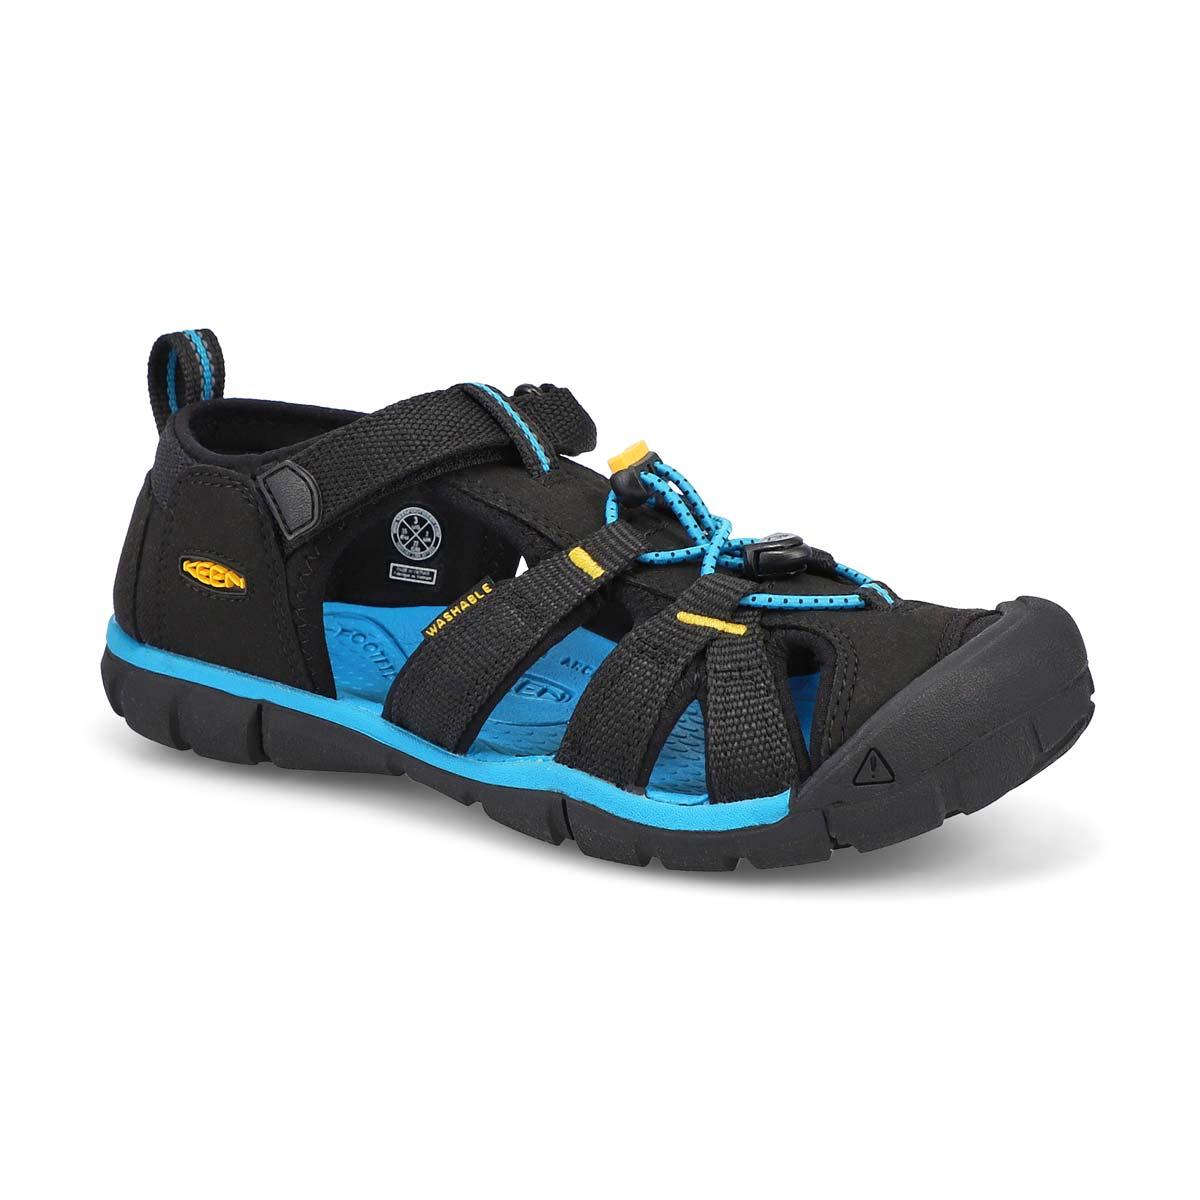 Boys' Seacamp II CNX Sport Sandal - Black/Yellow